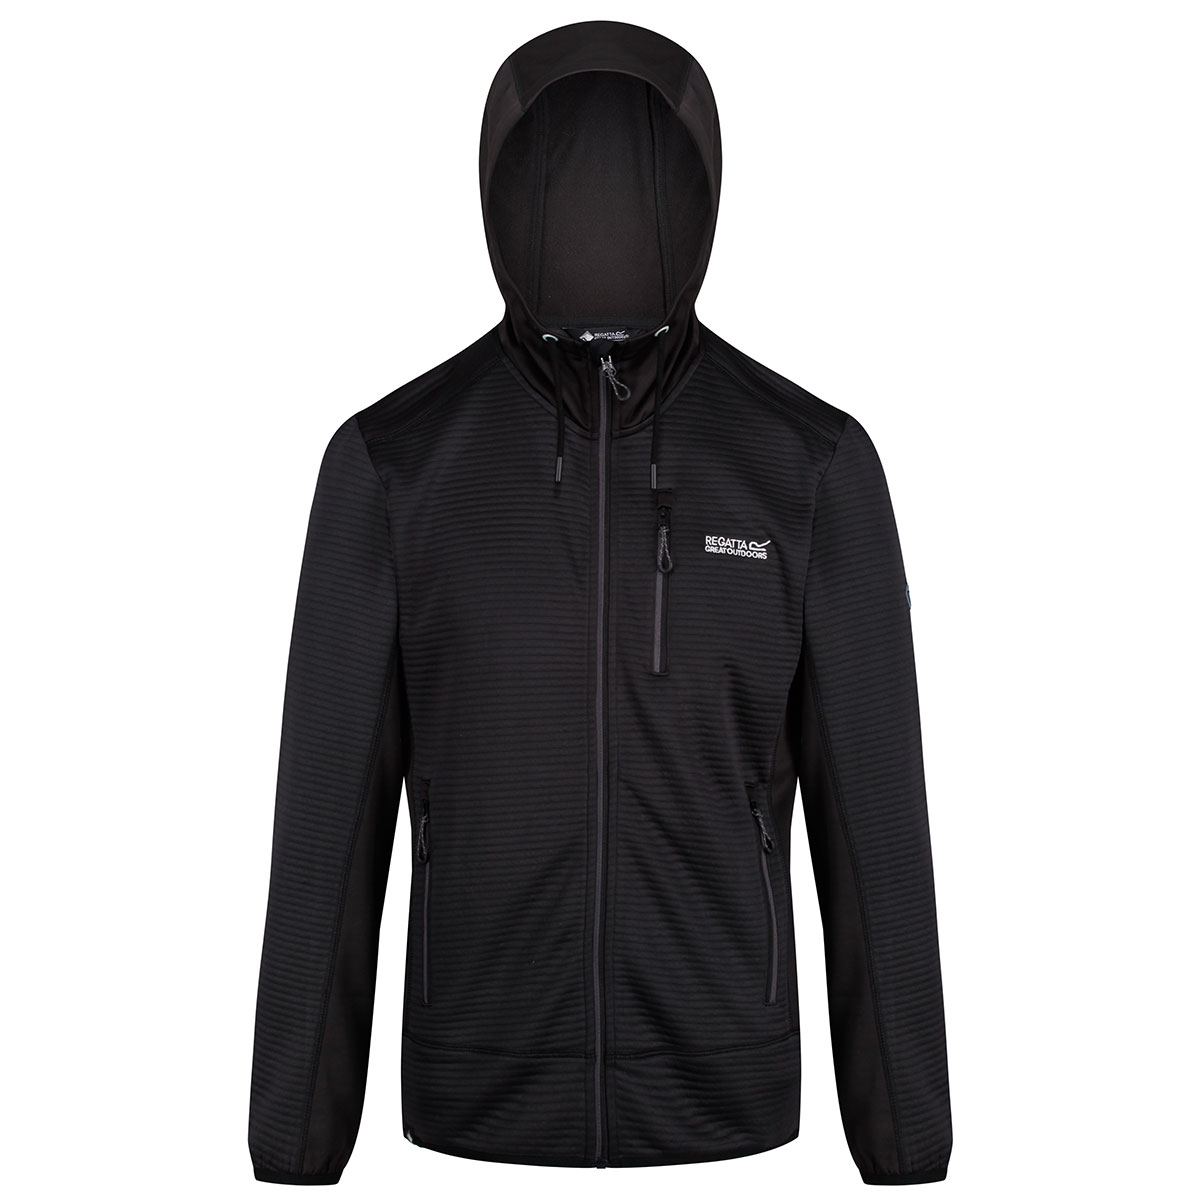 Regatta-Mens-Tarnis-II-Ribbed-Fabric-Stretch-Hoody-Jacket-70-OFF-RRP thumbnail 4